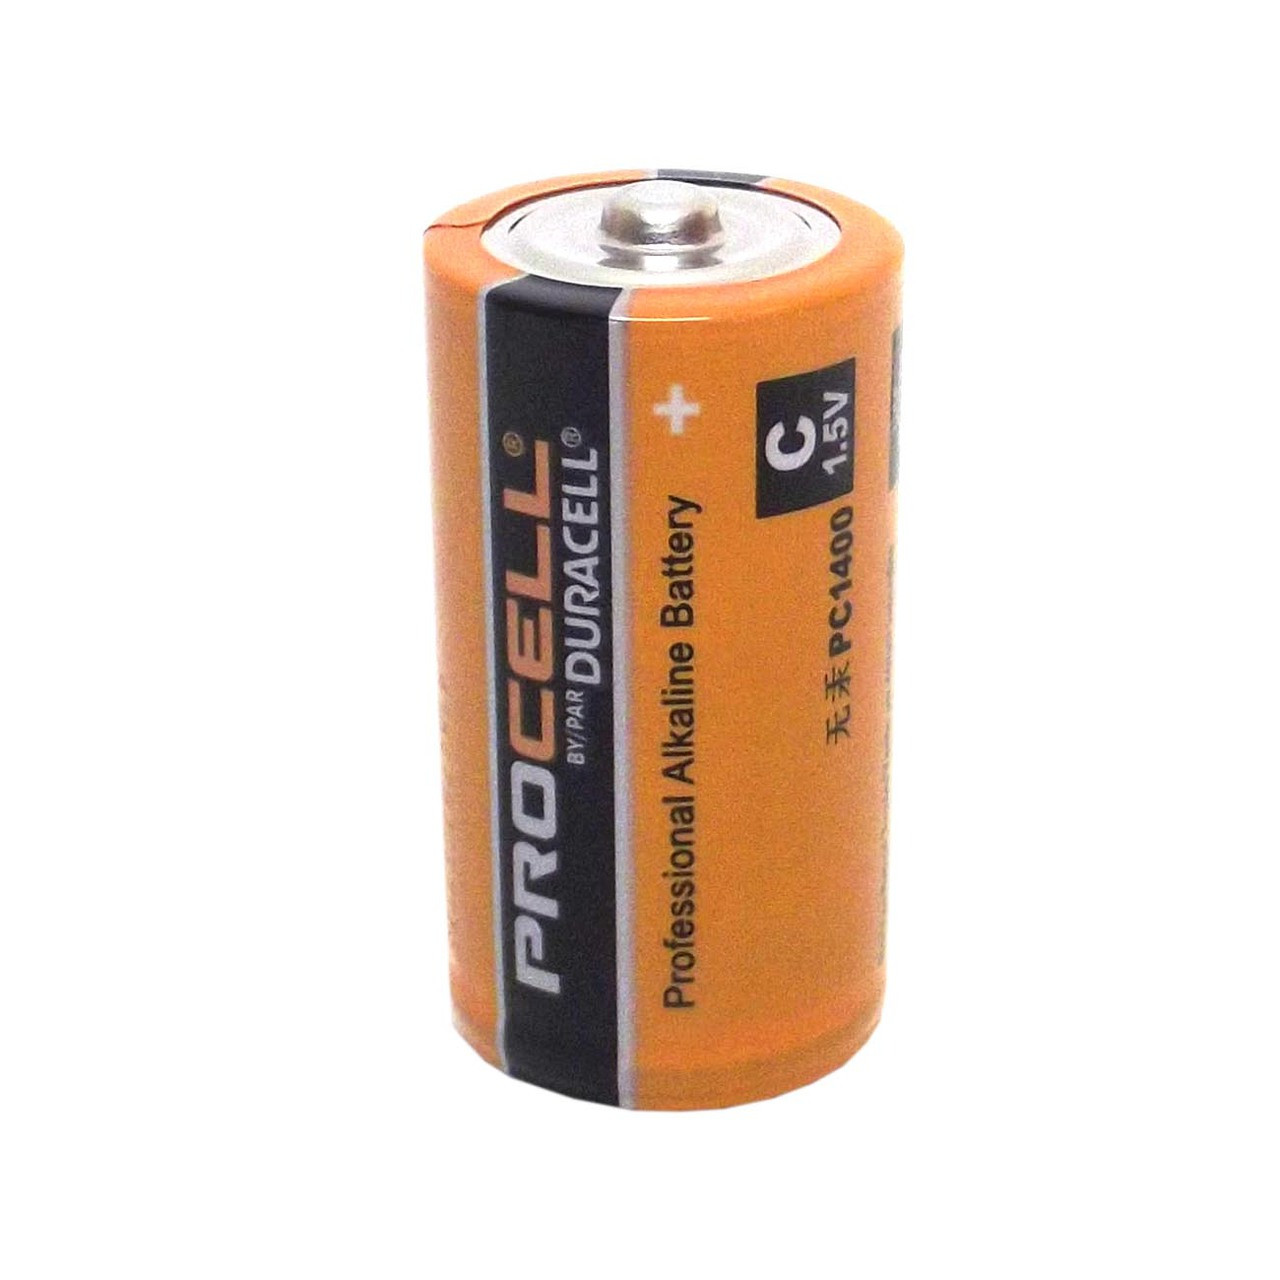 Alkaline Battery Diagram